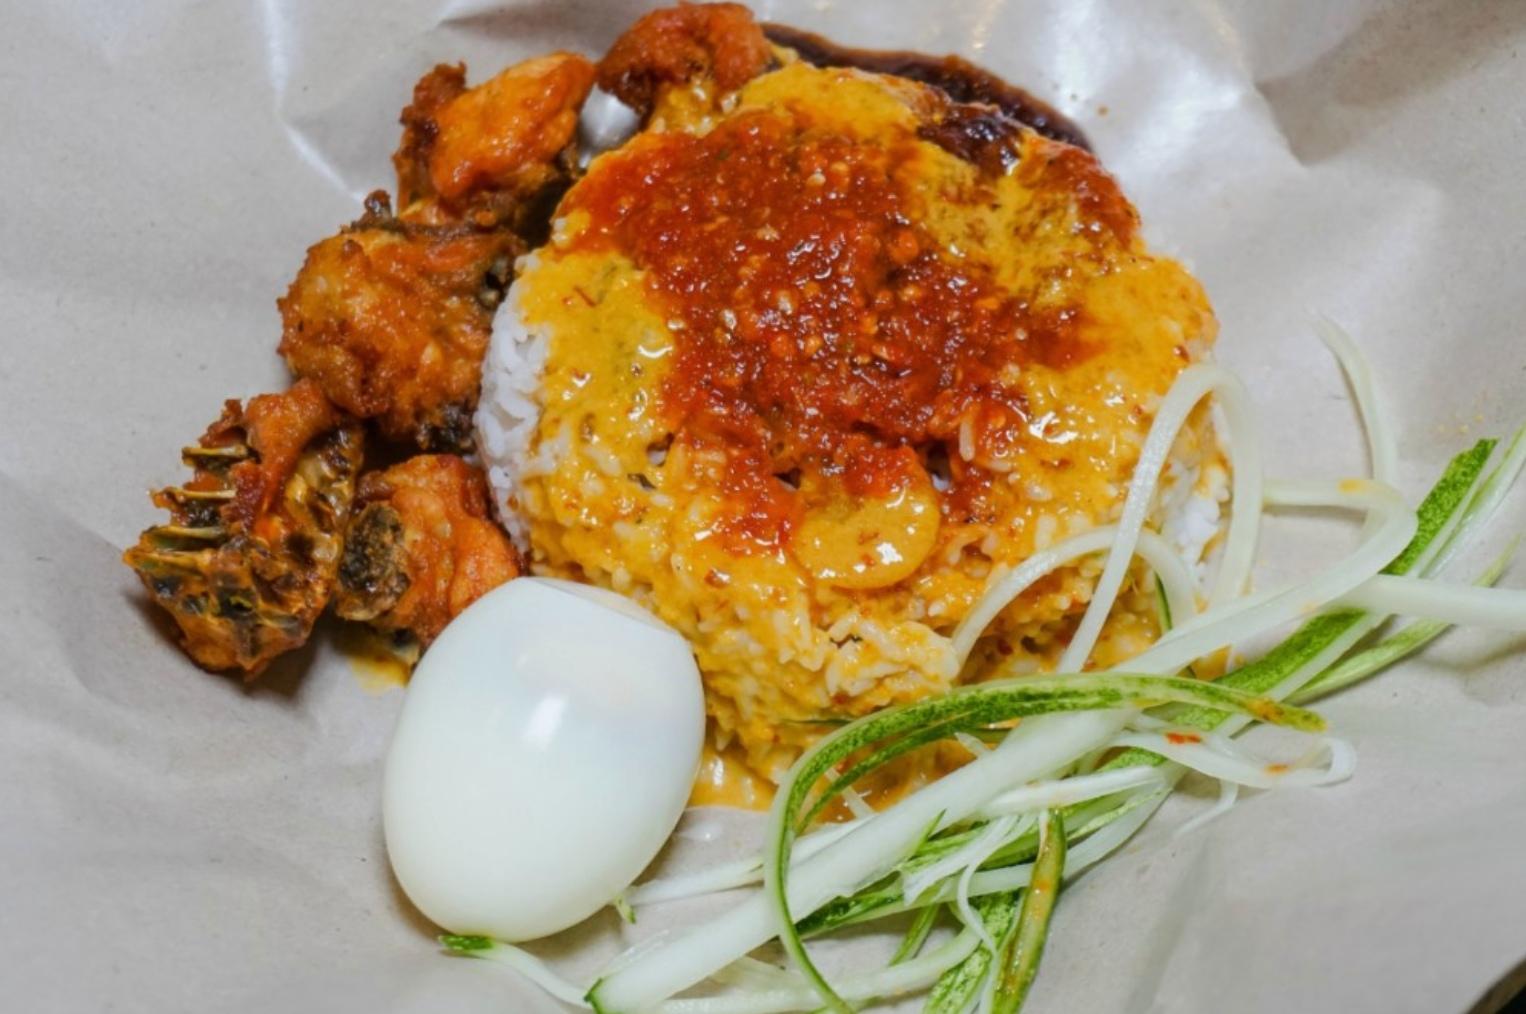 jalan jalan cari makan  picks Resepi Nasi Ayam Untuk Kanak Kanak Enak dan Mudah